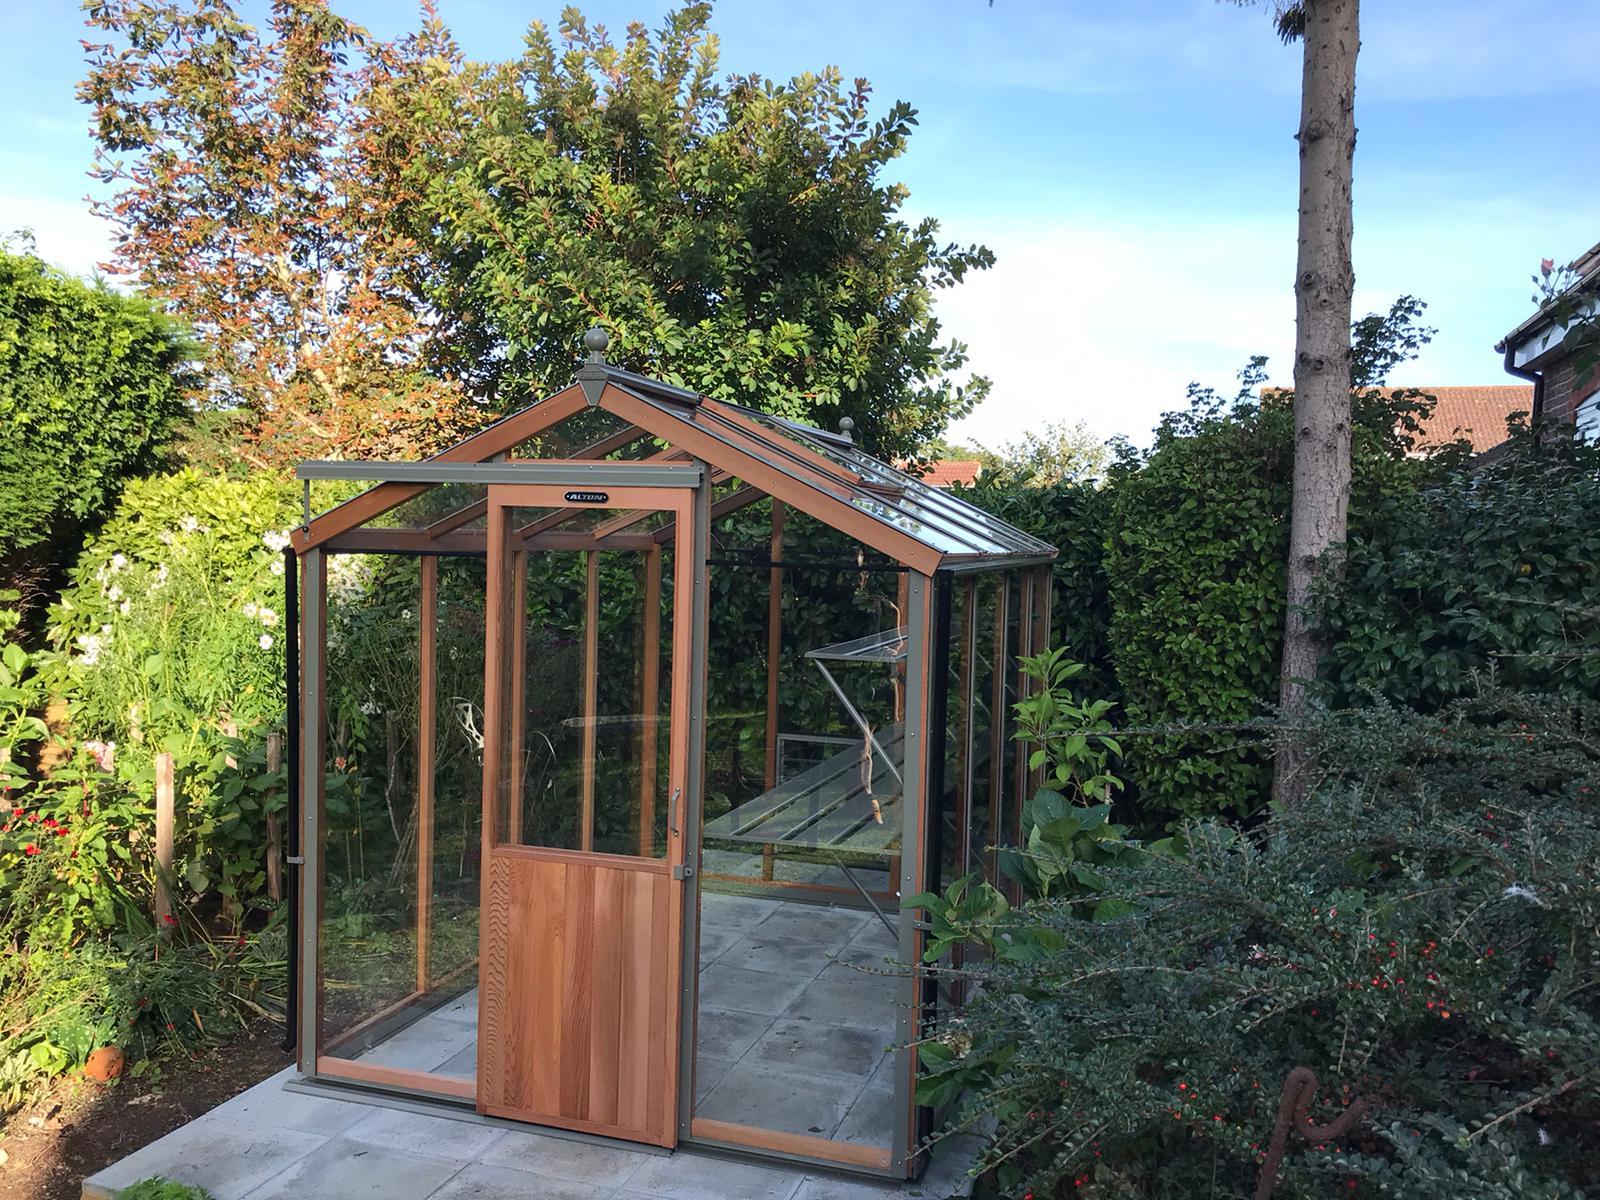 8ft x 6ft Alton Greenhouse Installation in Billingshurst West Sussex - Magson